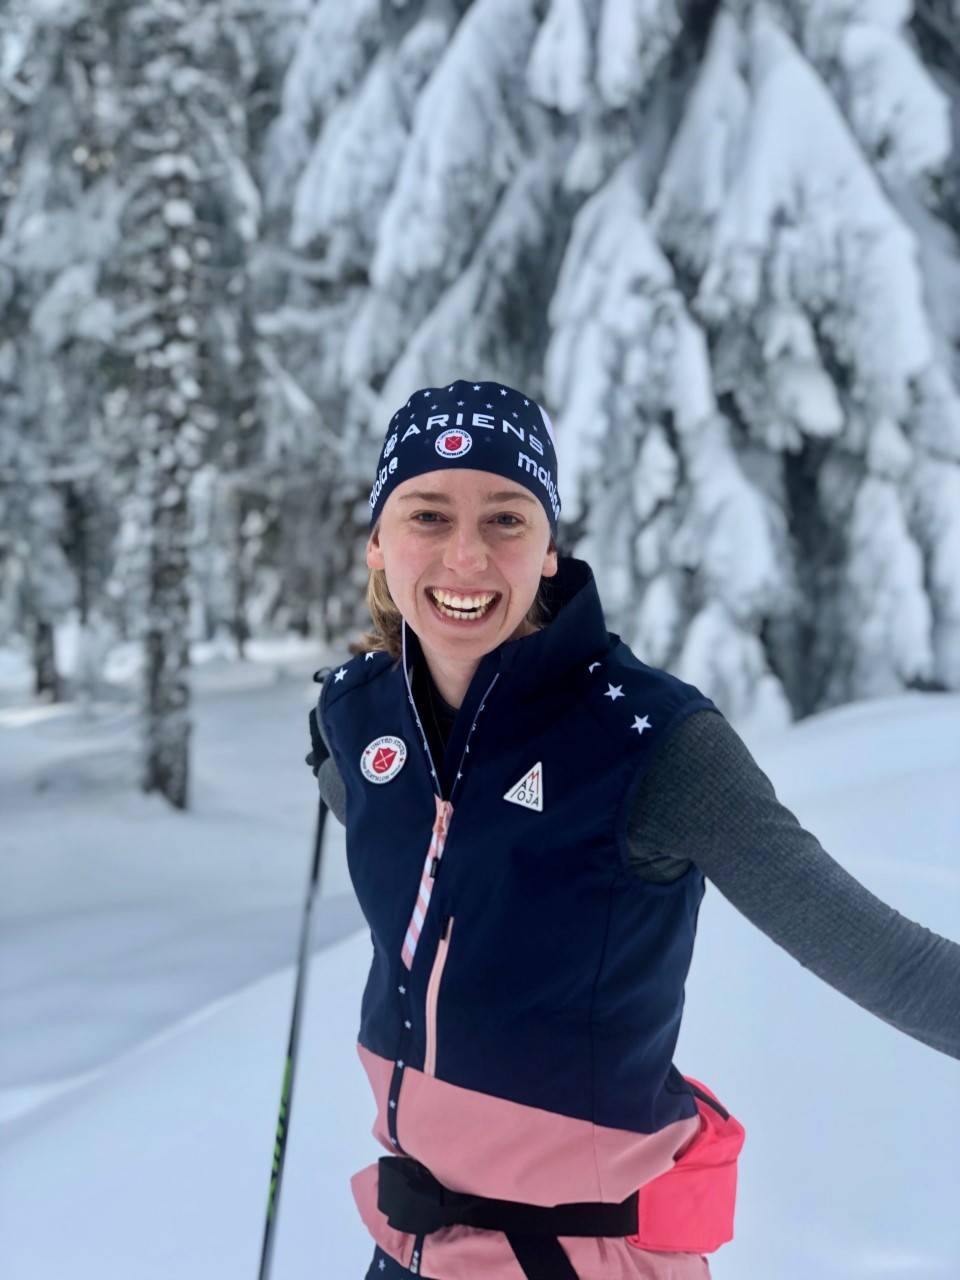 Lucy Hochschartner is an elite biathlete